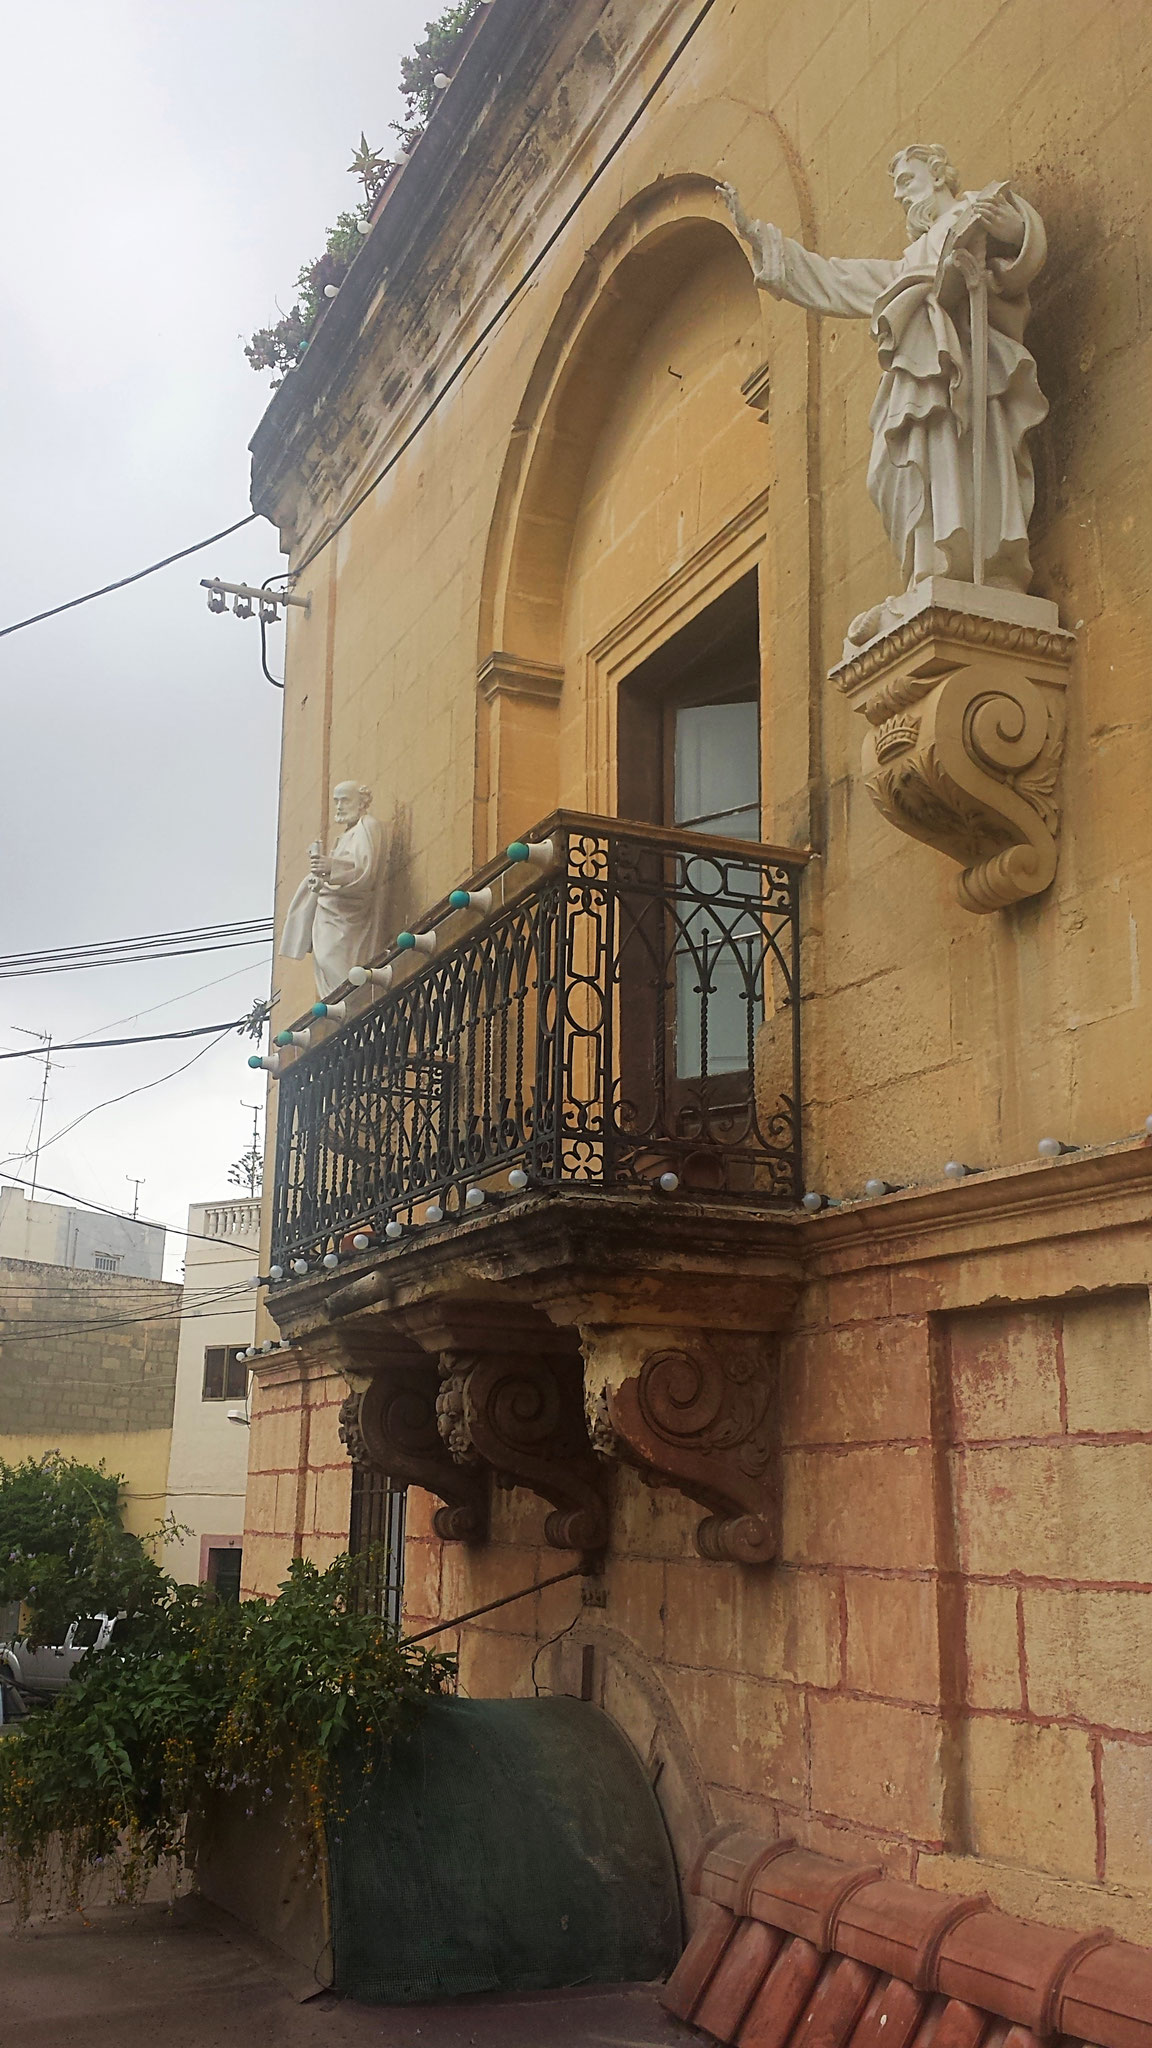 Malta Balkon